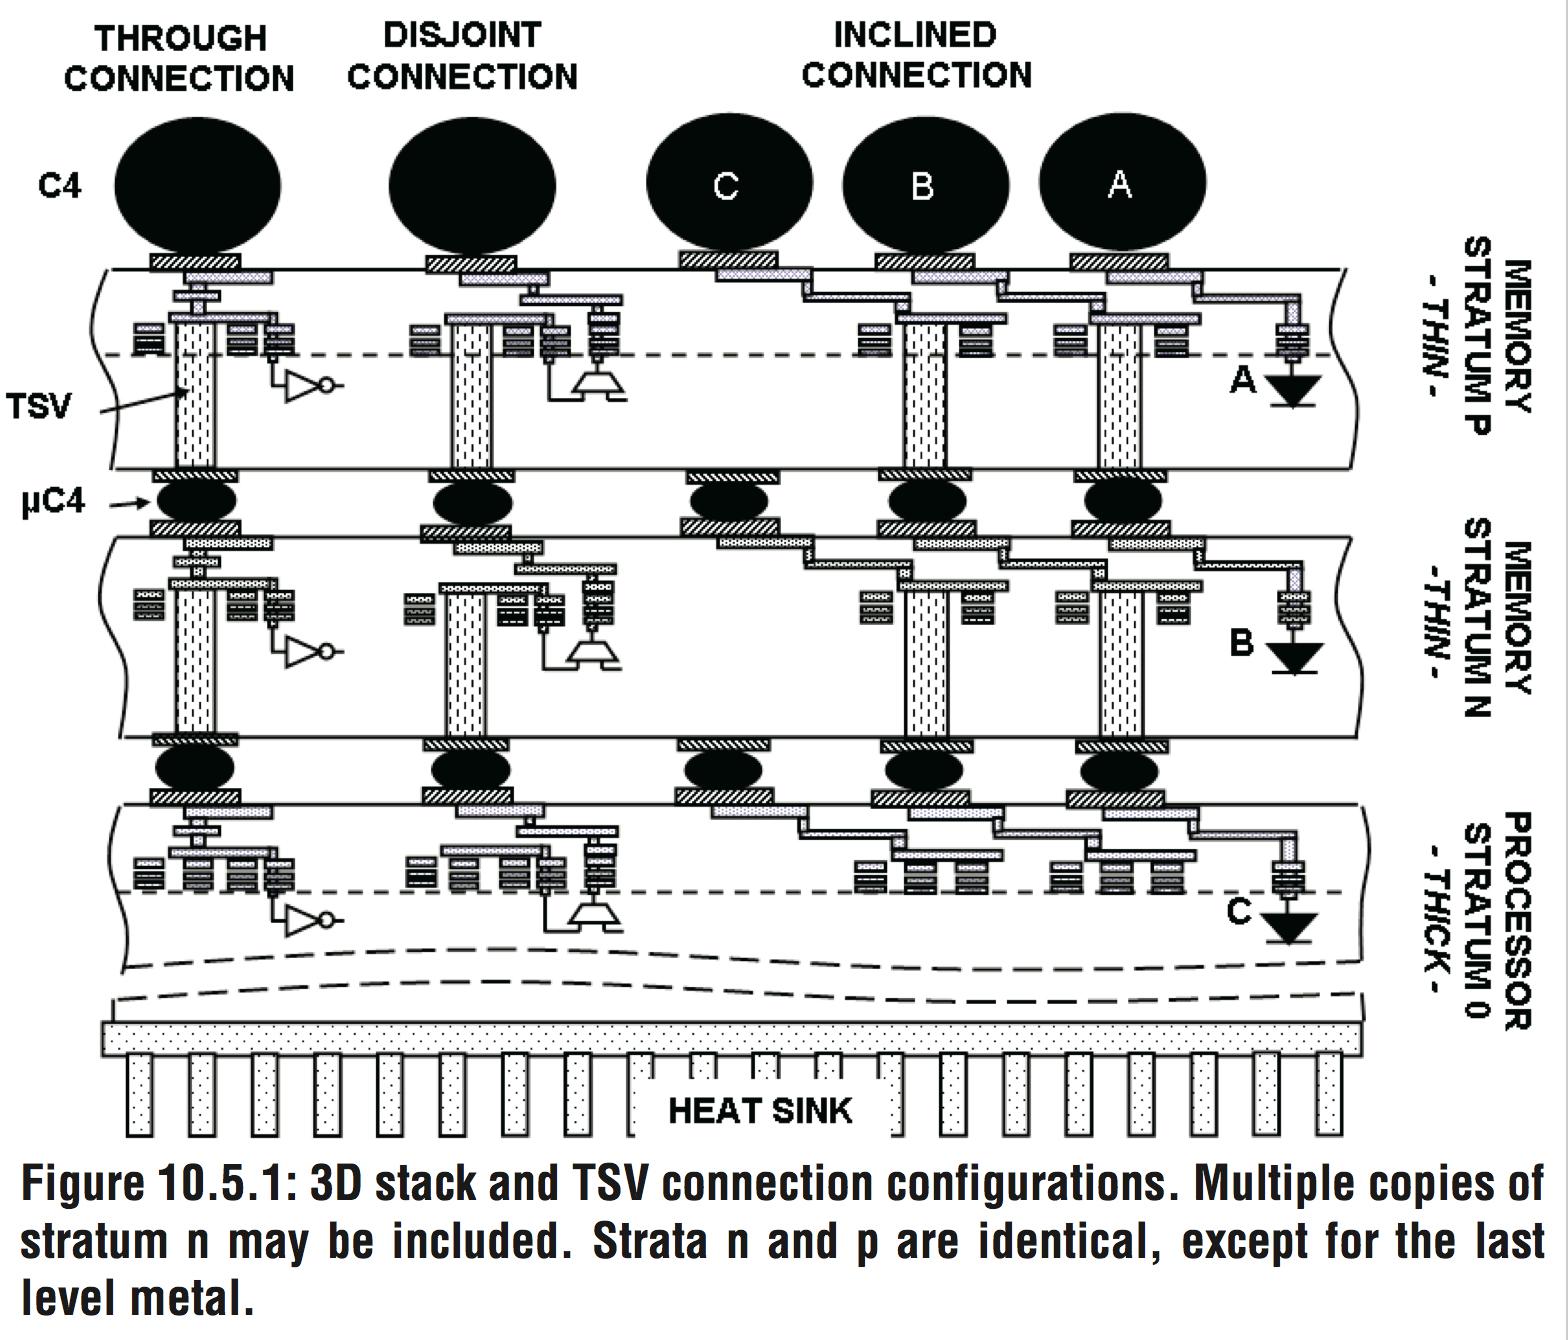 3d Processor Memory Mashups Take Center Stage The Register